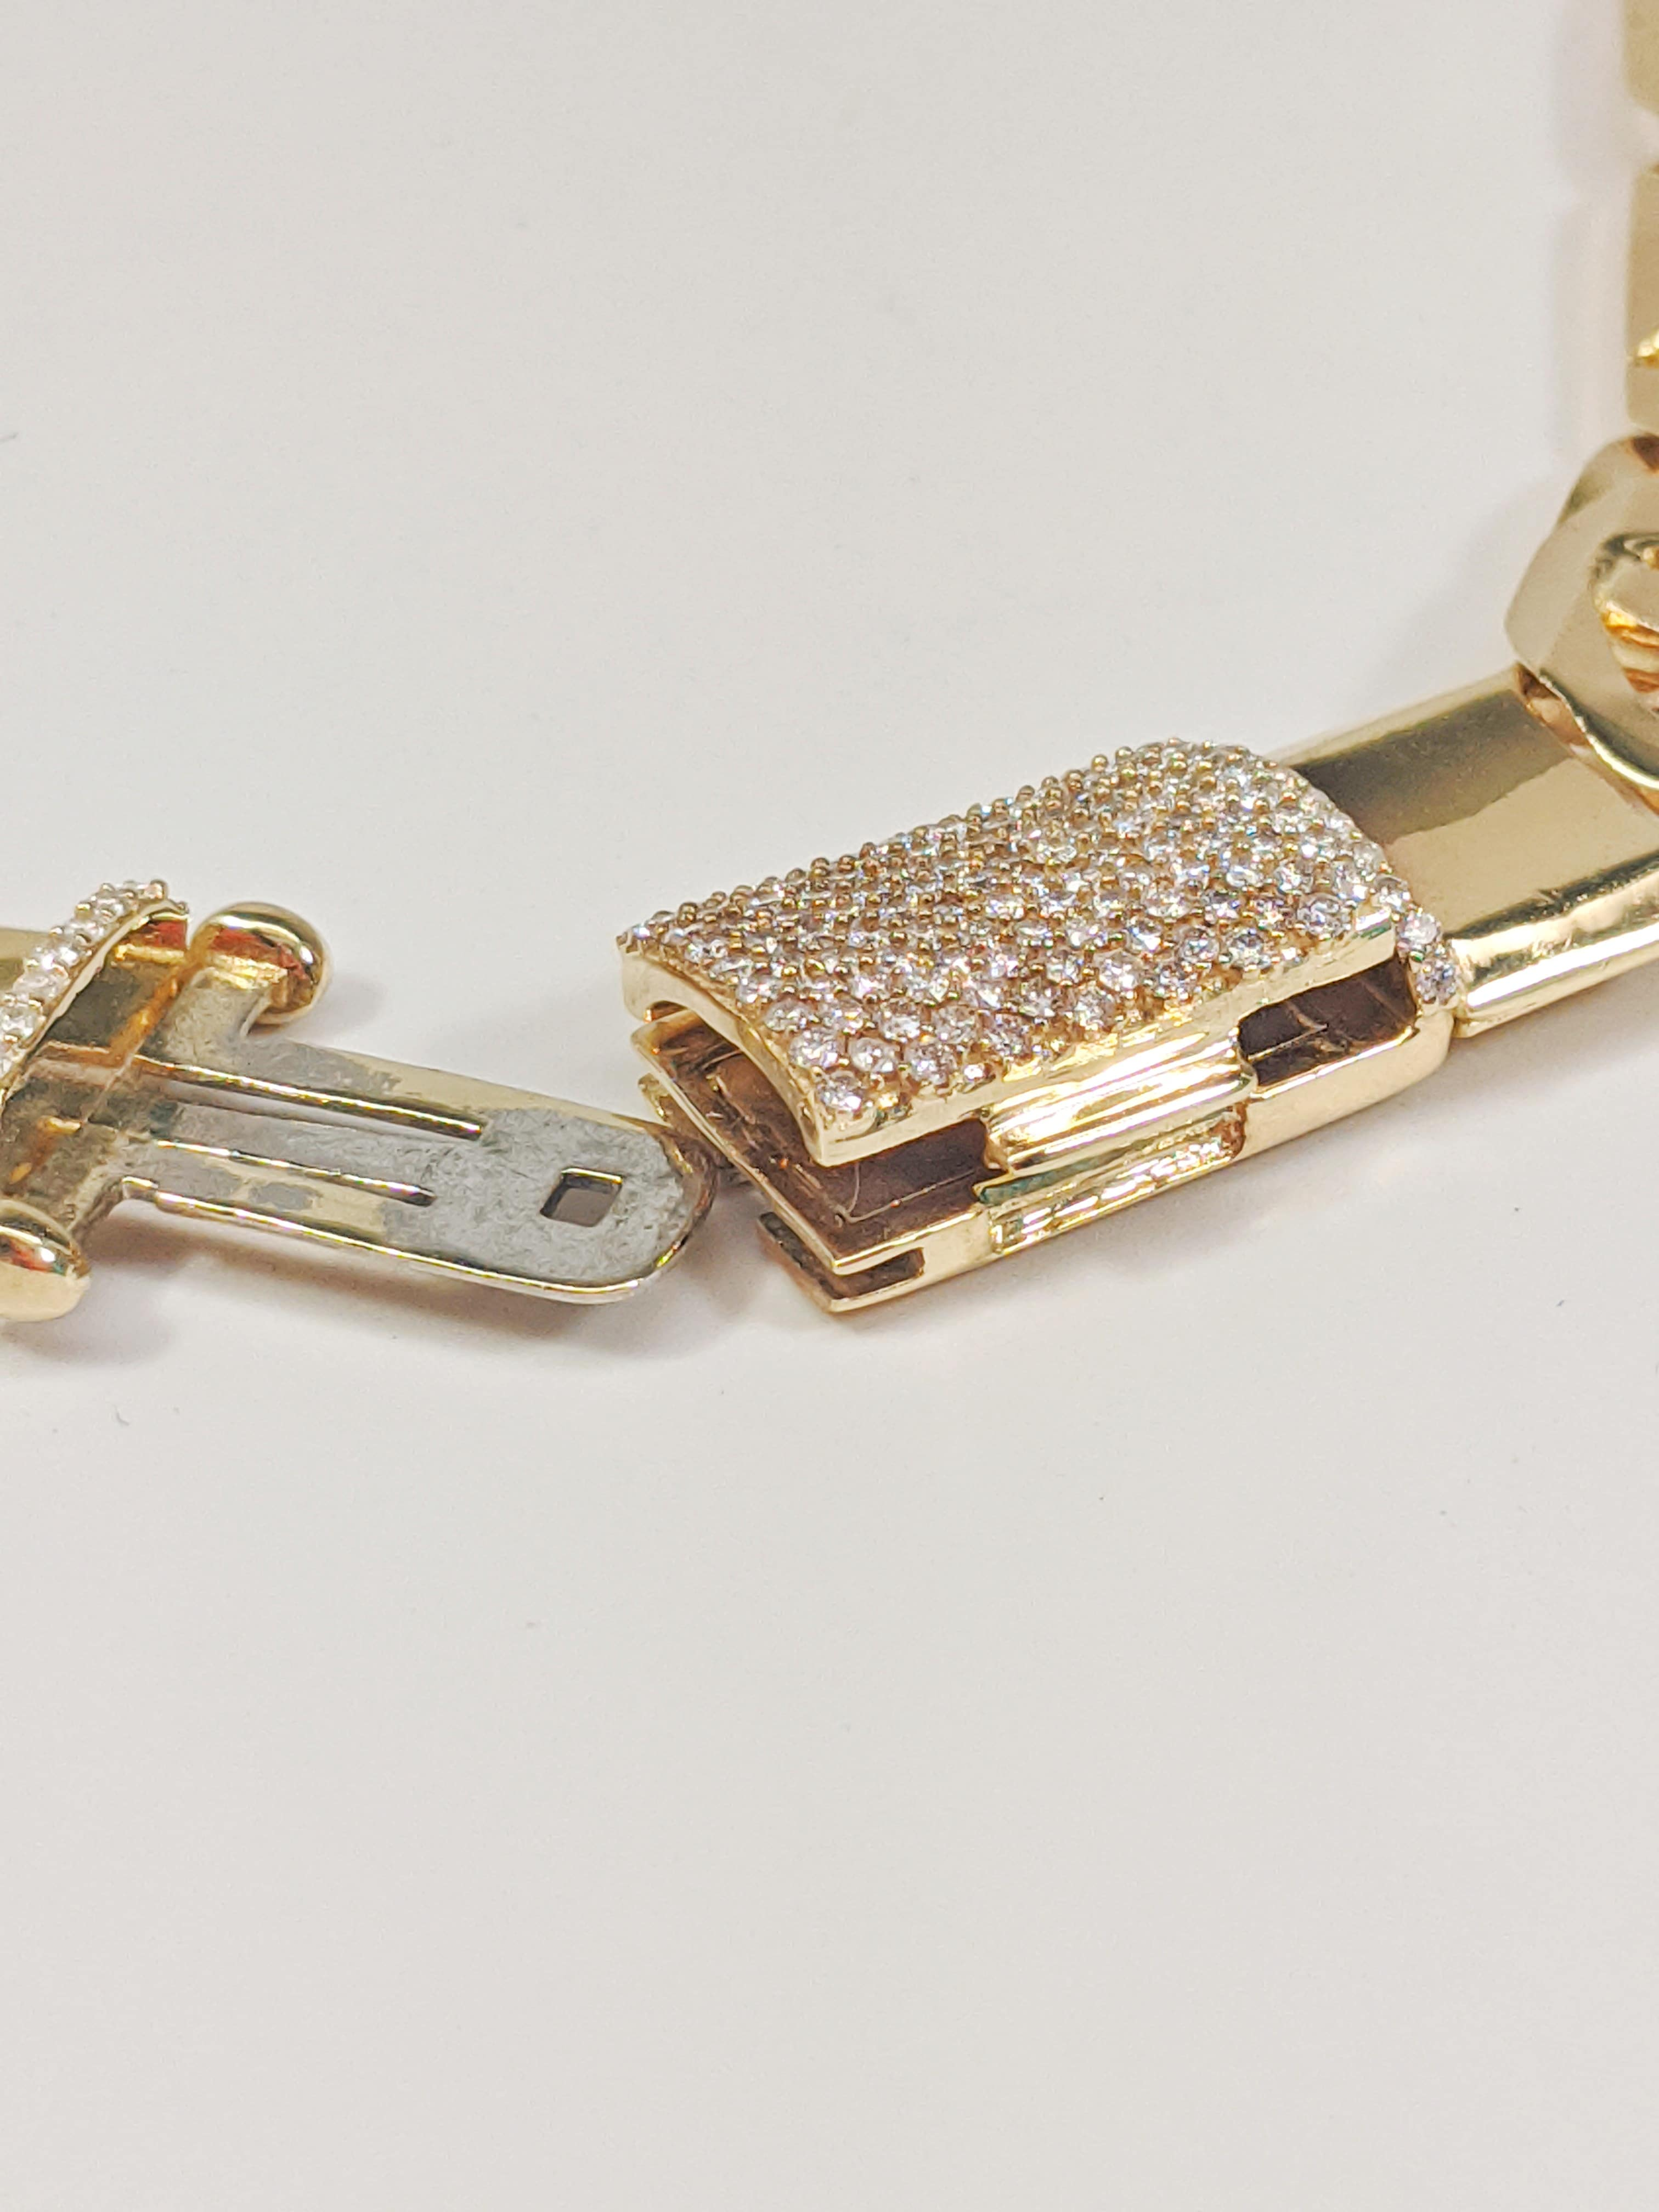 14KT Yellow Gold Solid Heavy Fancy Tiger Eye Link Chain, Hand Made Italian Chain 12MM wide, VVS Pave Diamond Lock, Cuban Box Lock, Open Lock